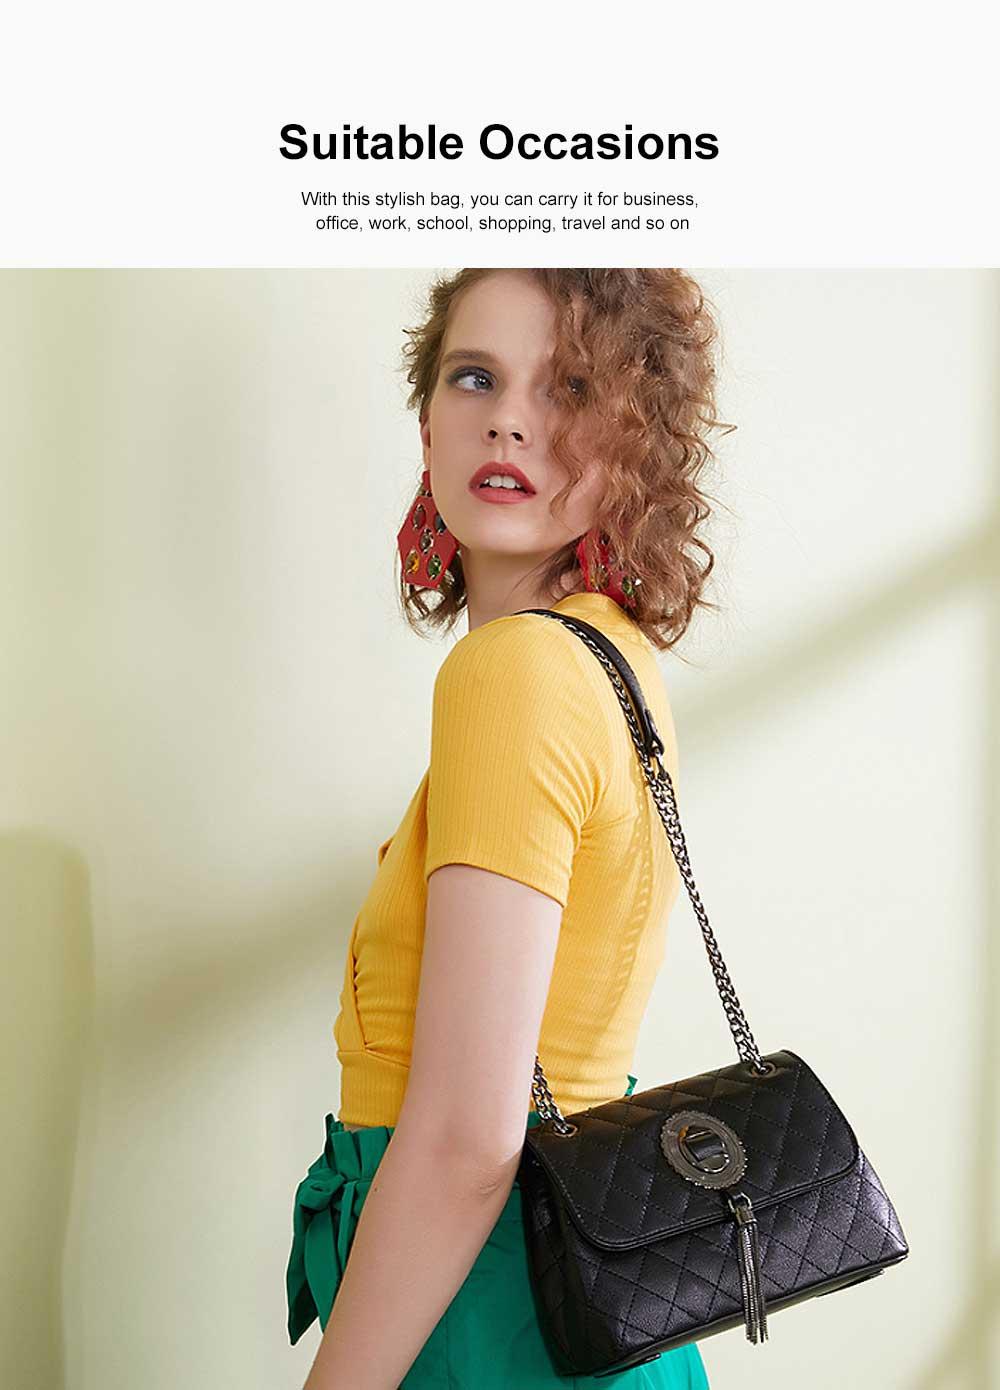 Women Shoulder Bag Fashion Mini Cross-Body Bag Wedding Party Handbag Classic Style for Women Girls 3